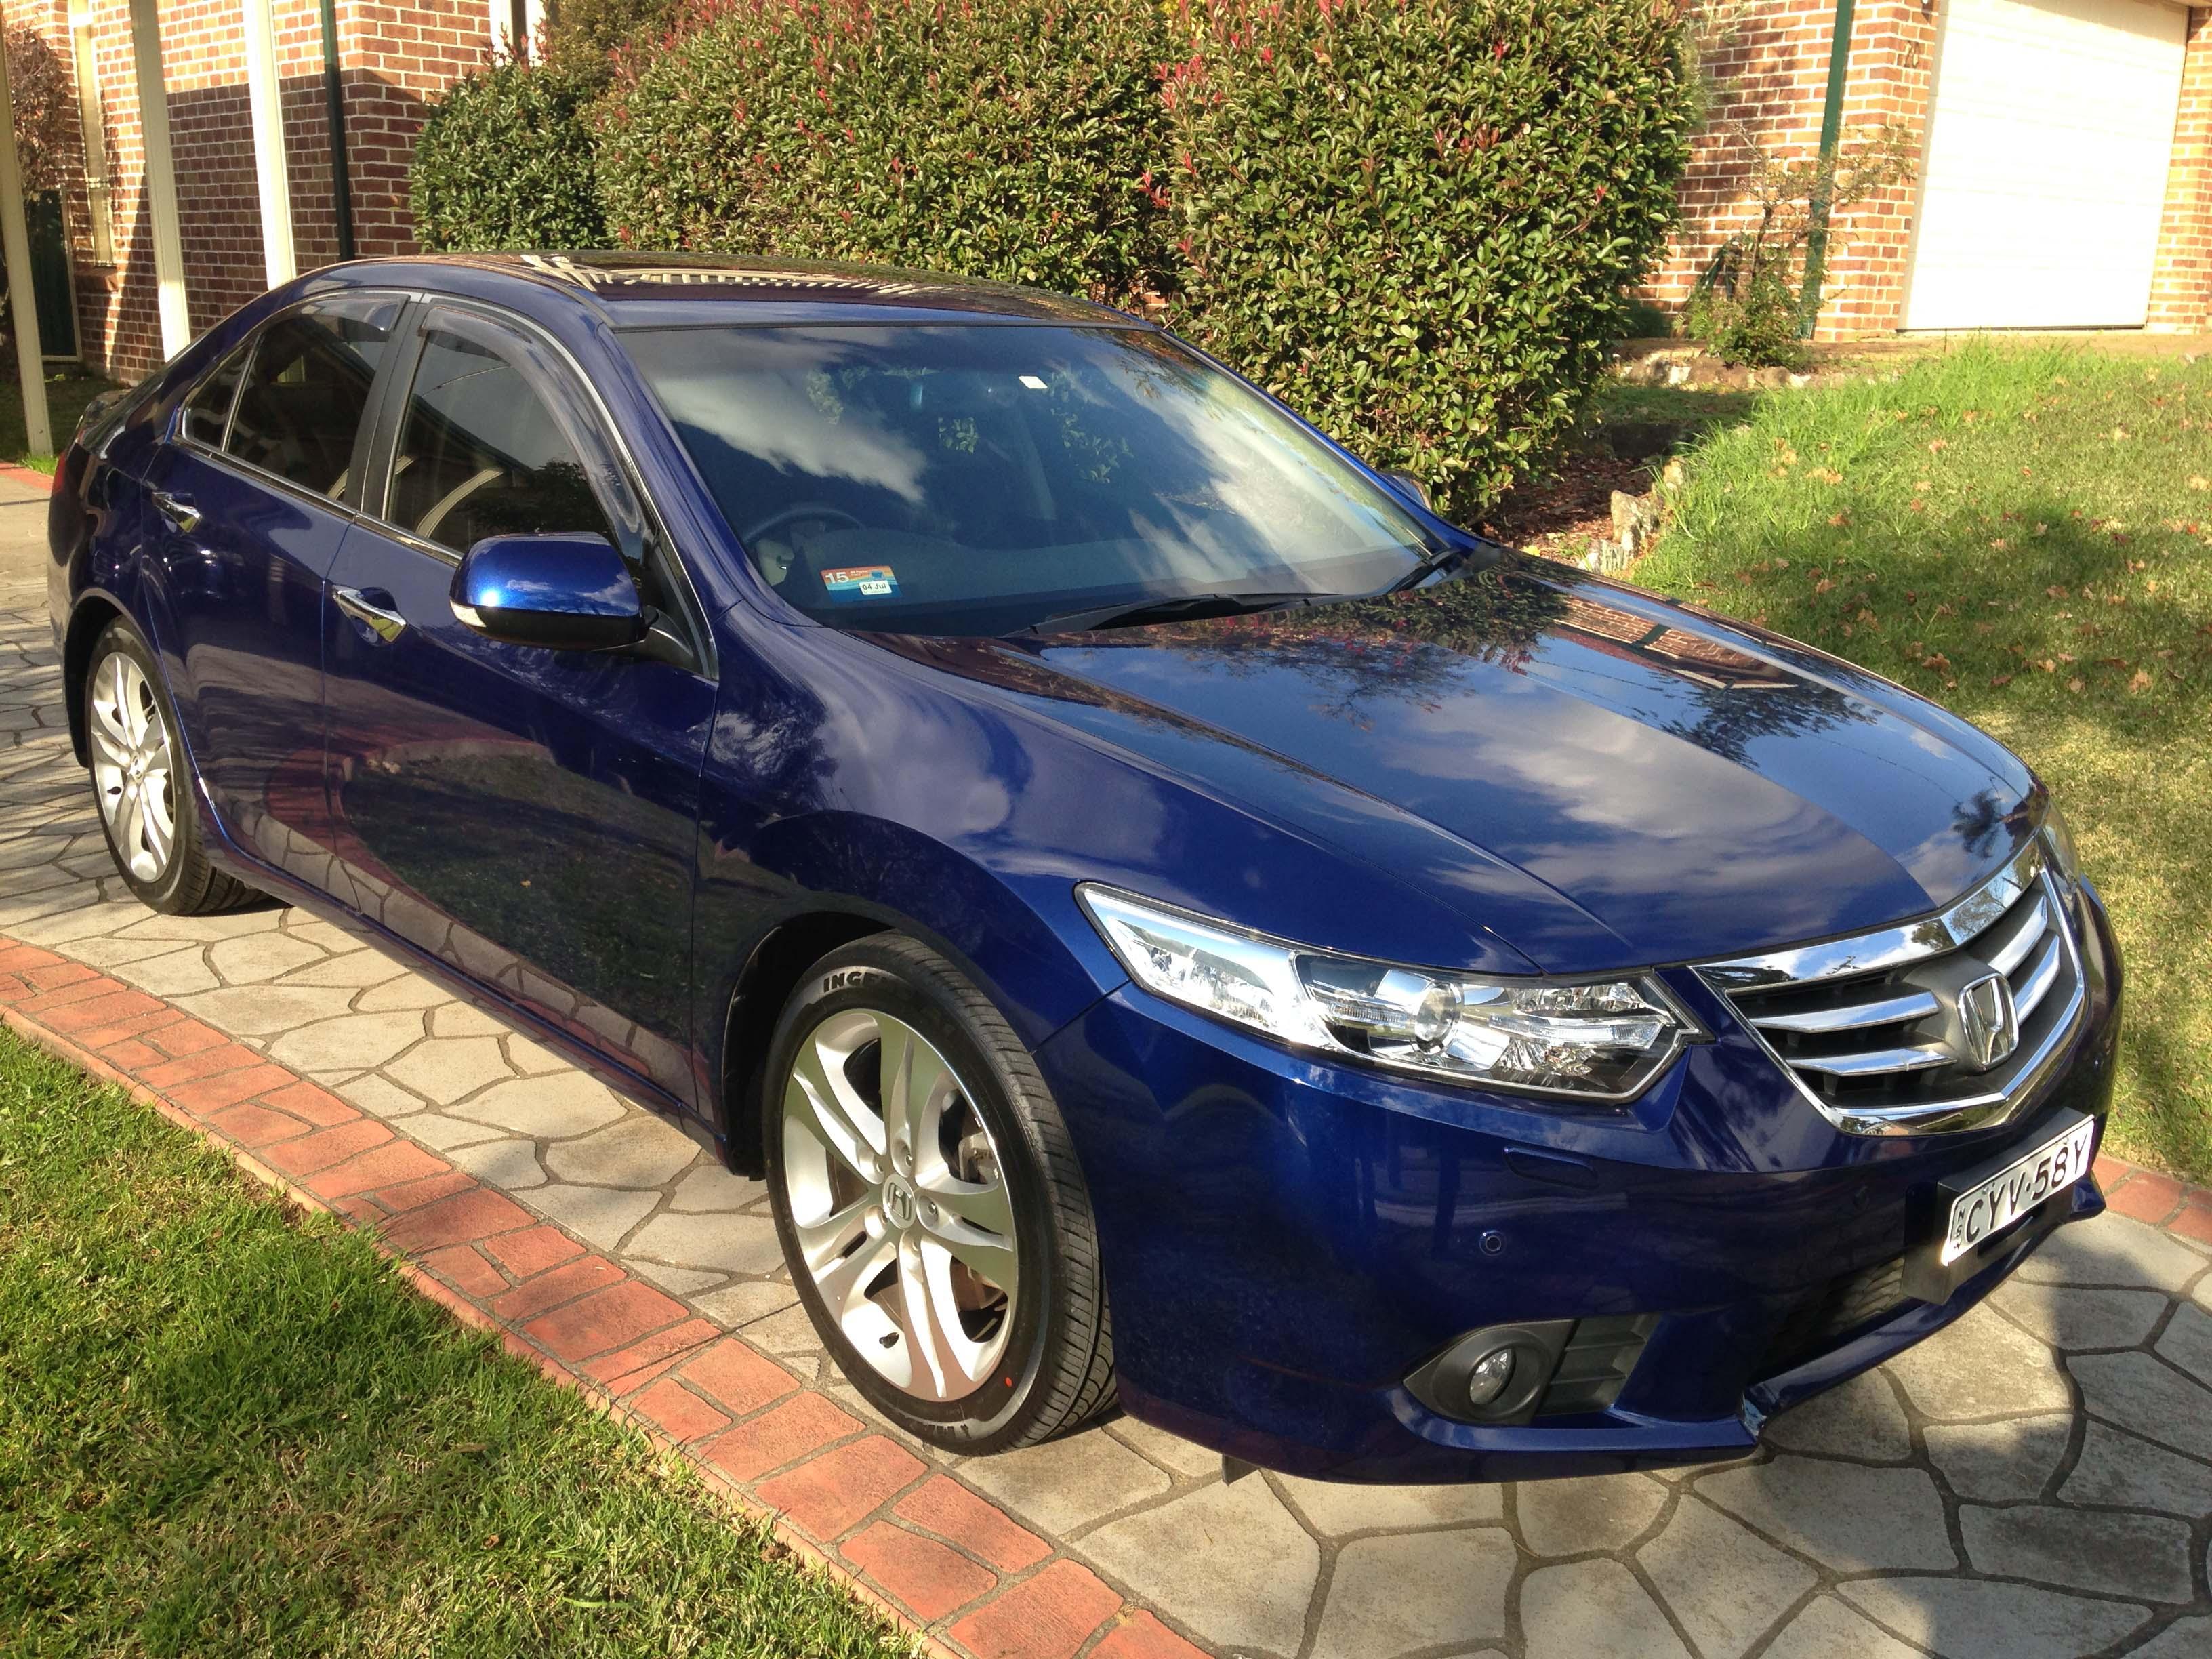 Cars For Sale Rockhampton >> 2012 Honda Accord Euro | Car Sales NSW: Sydney North #2677830